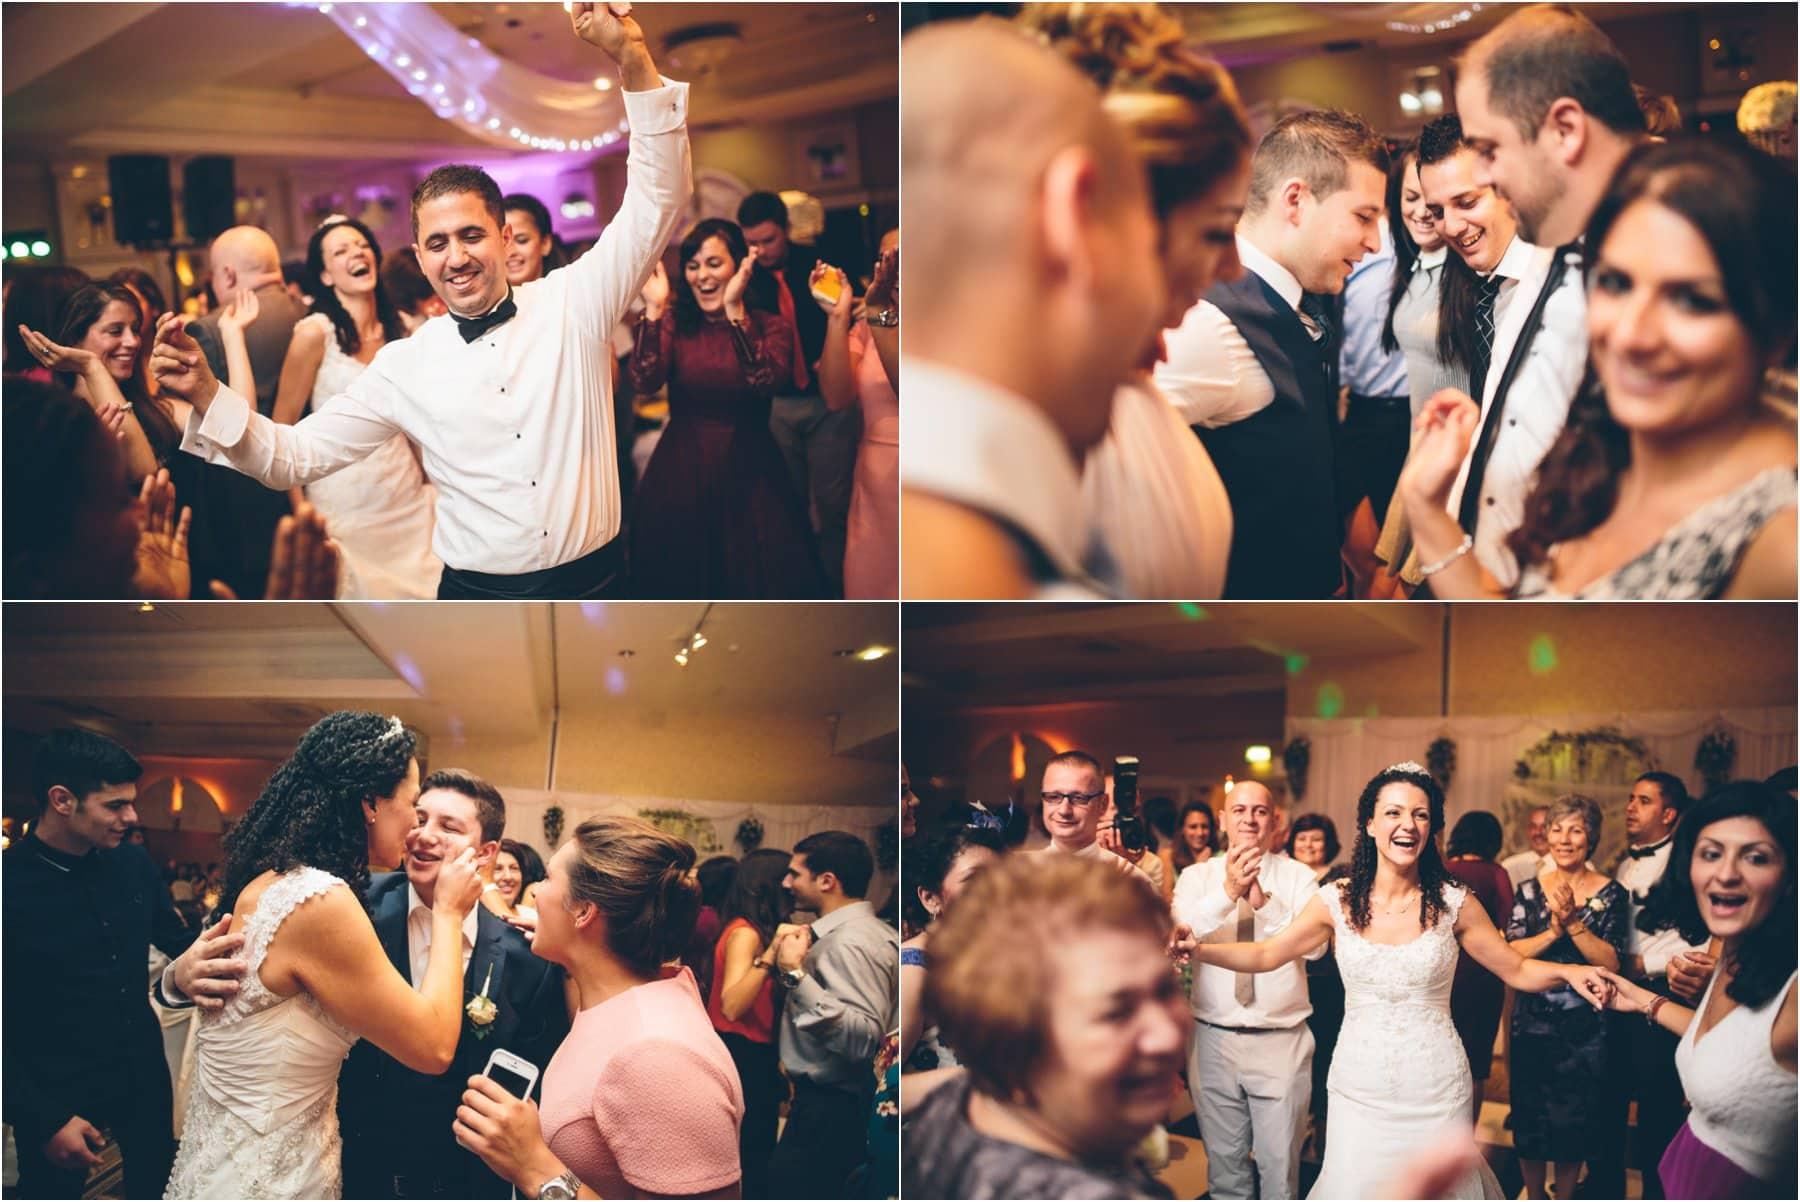 Midland_Manchester_Wedding_Photography_0112